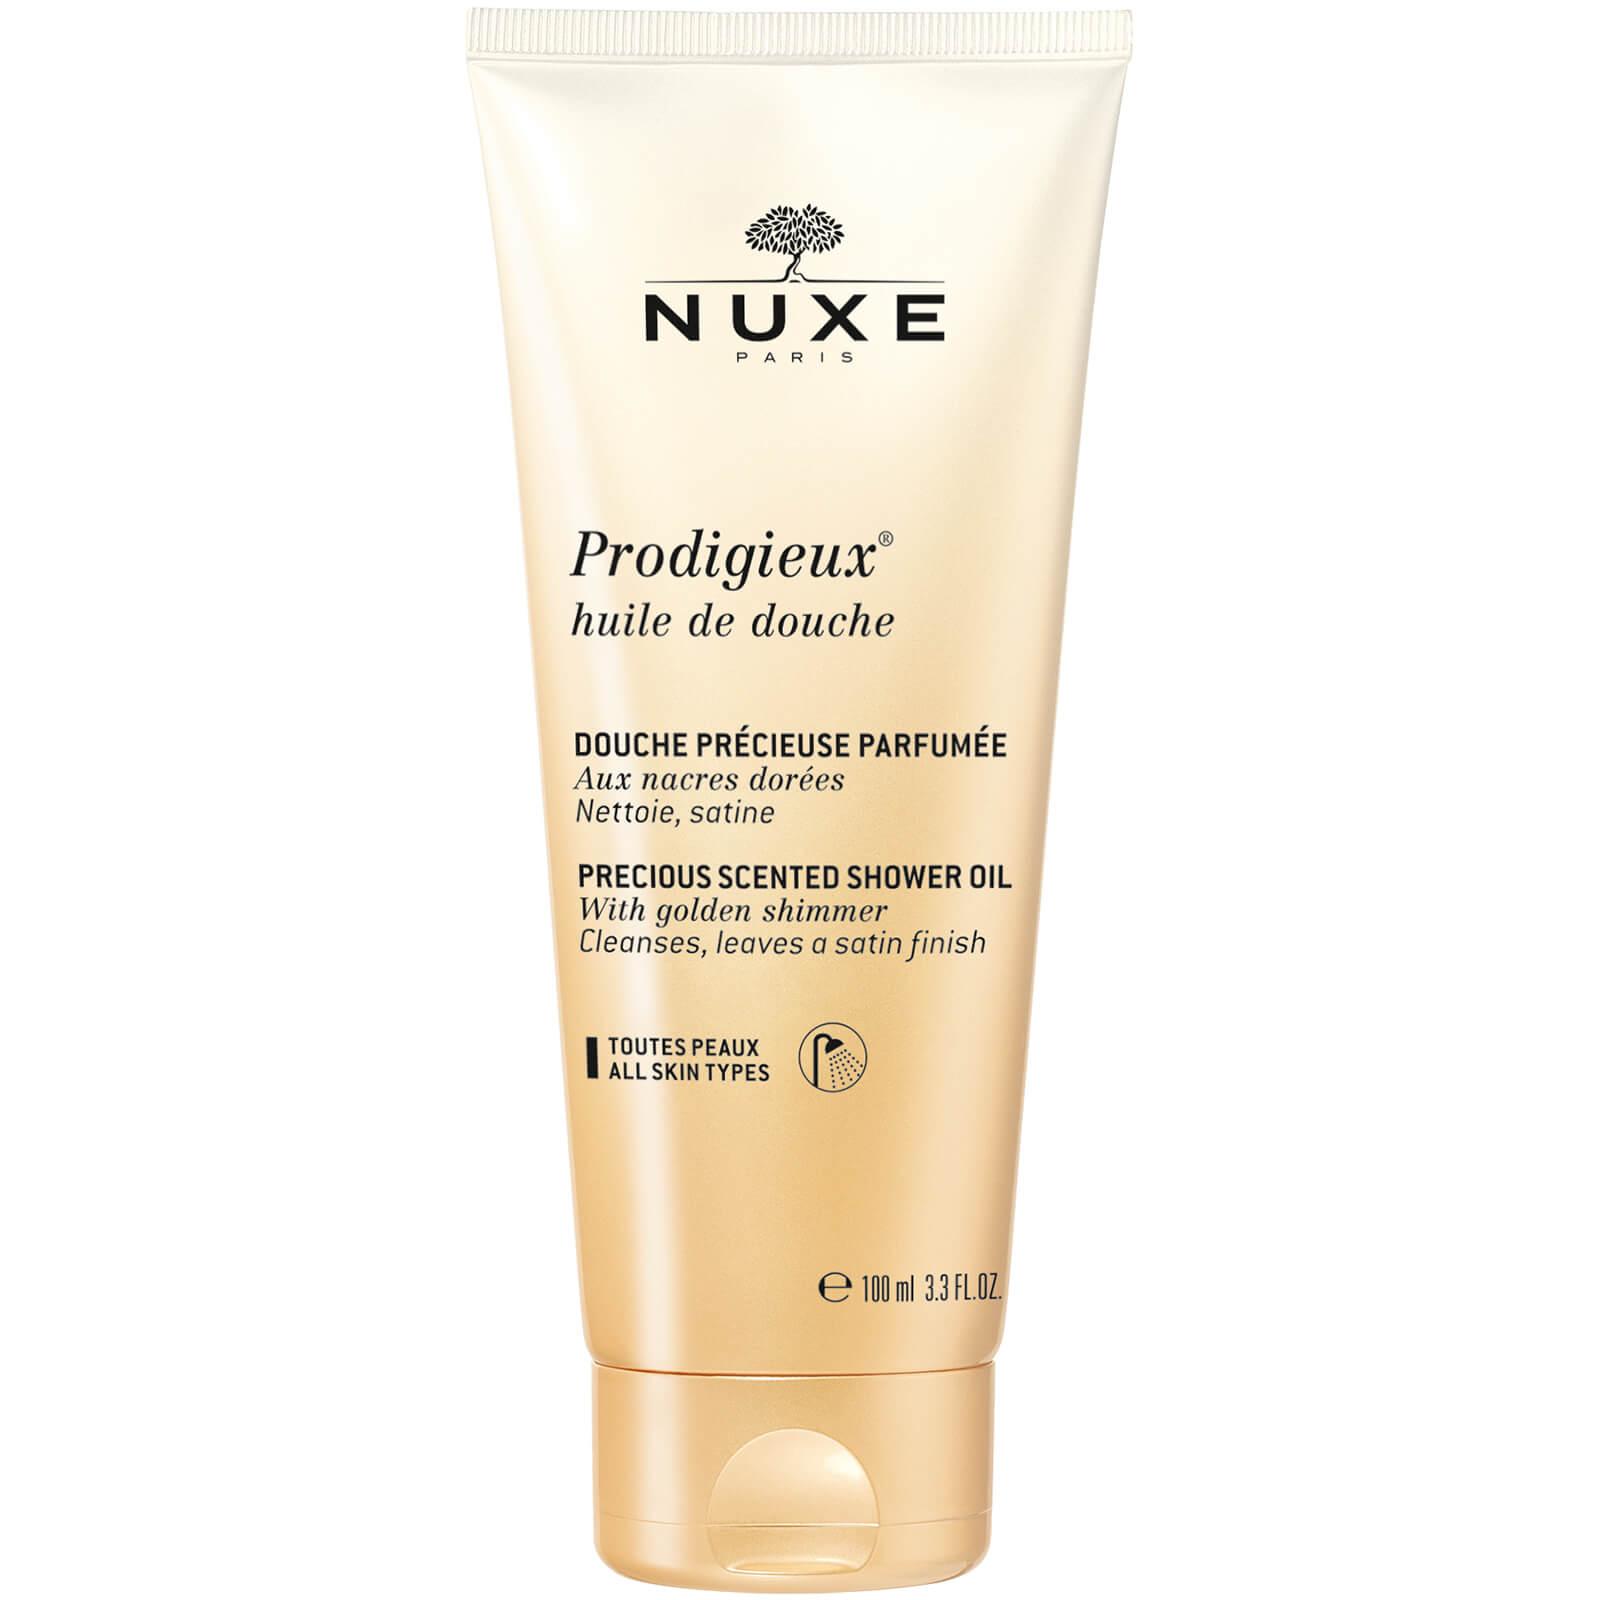 NUXE Prodigieux Shower Oil 100ml